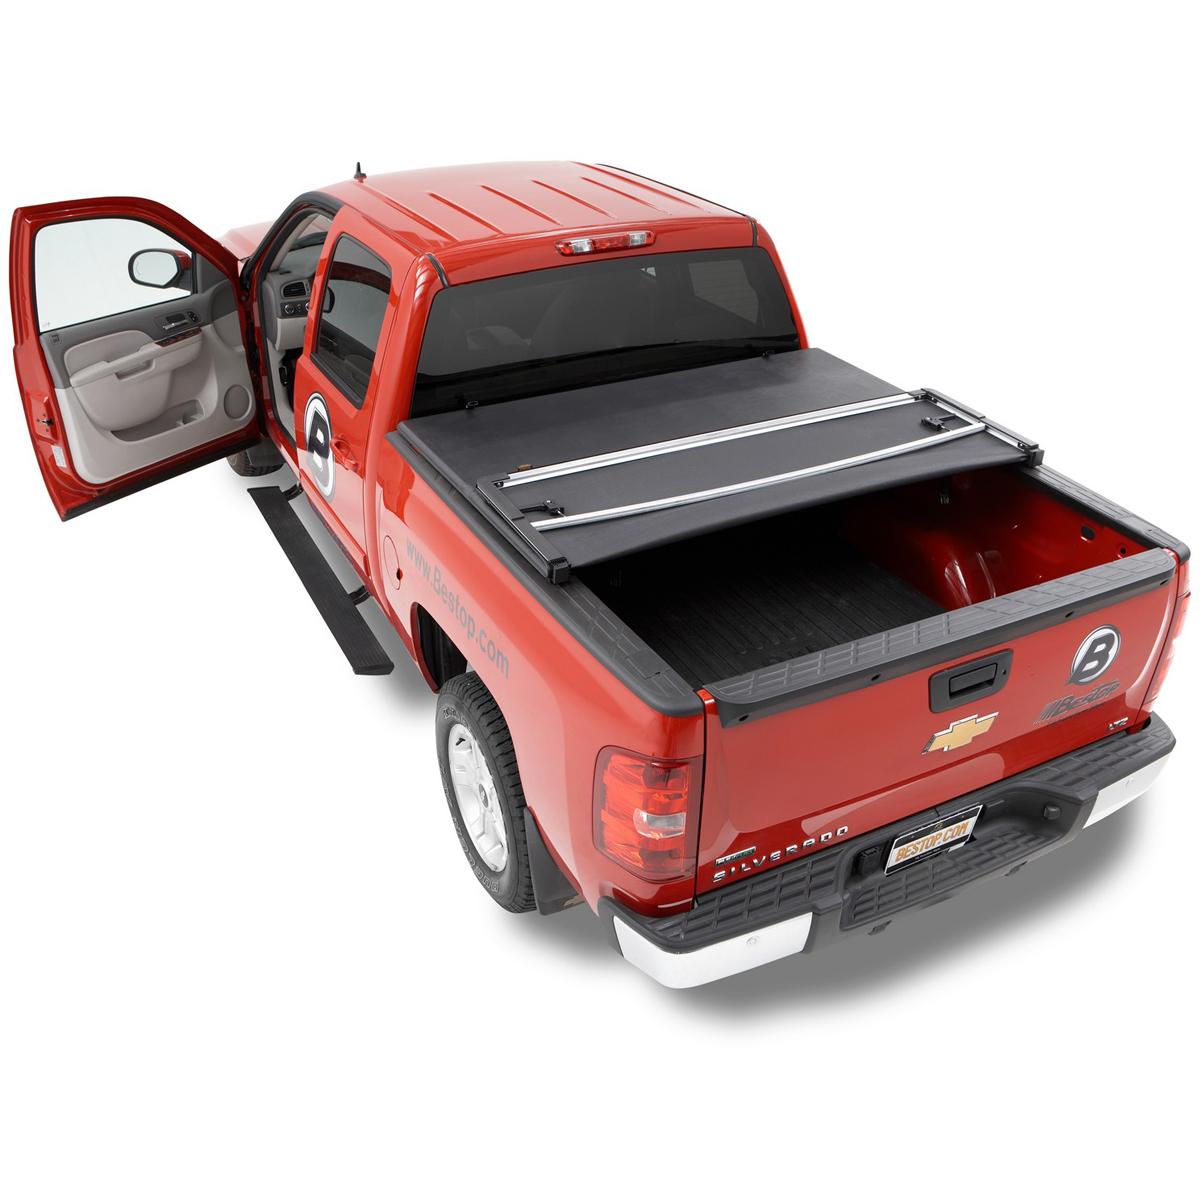 Bestop Powerboard Automatic Running Boards For Dodge Ram: 16211-01 Bestop EZ Fold Tonneau Cover For Silverado